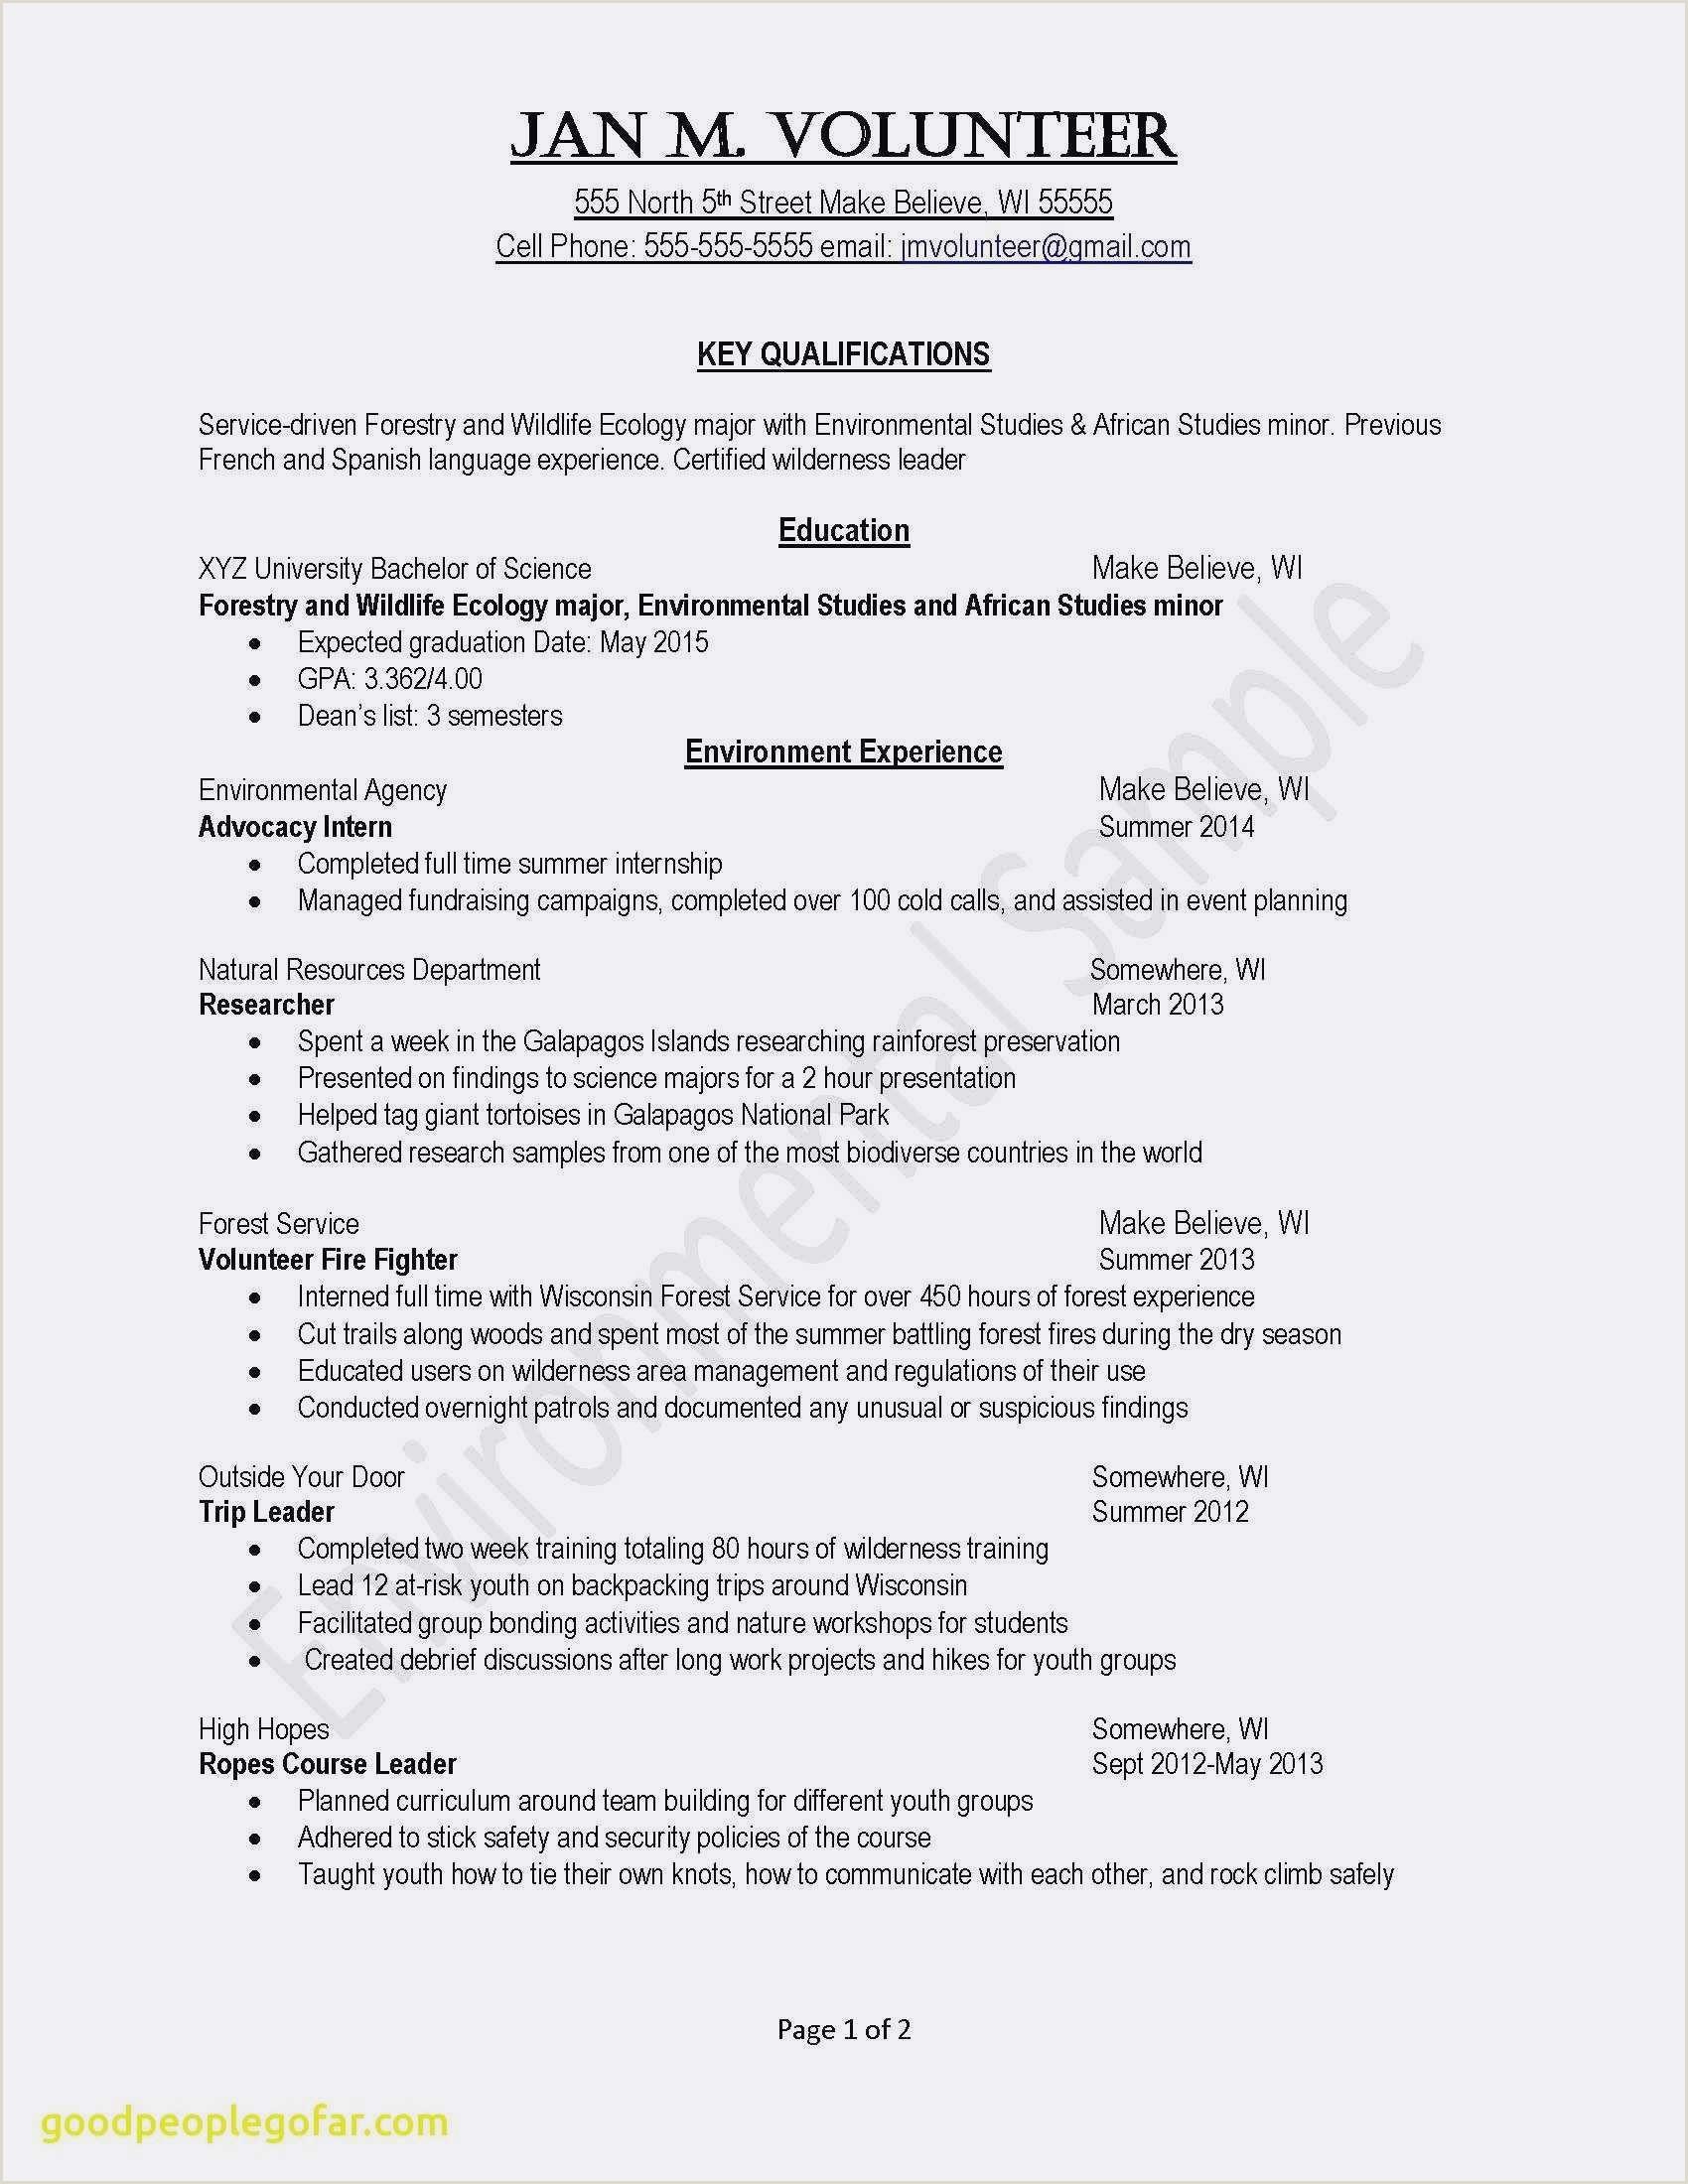 Cv Format For Environmental Jobs Cv Avec Frais Cv 16 Ans Exemple Fresh Examples Resumes